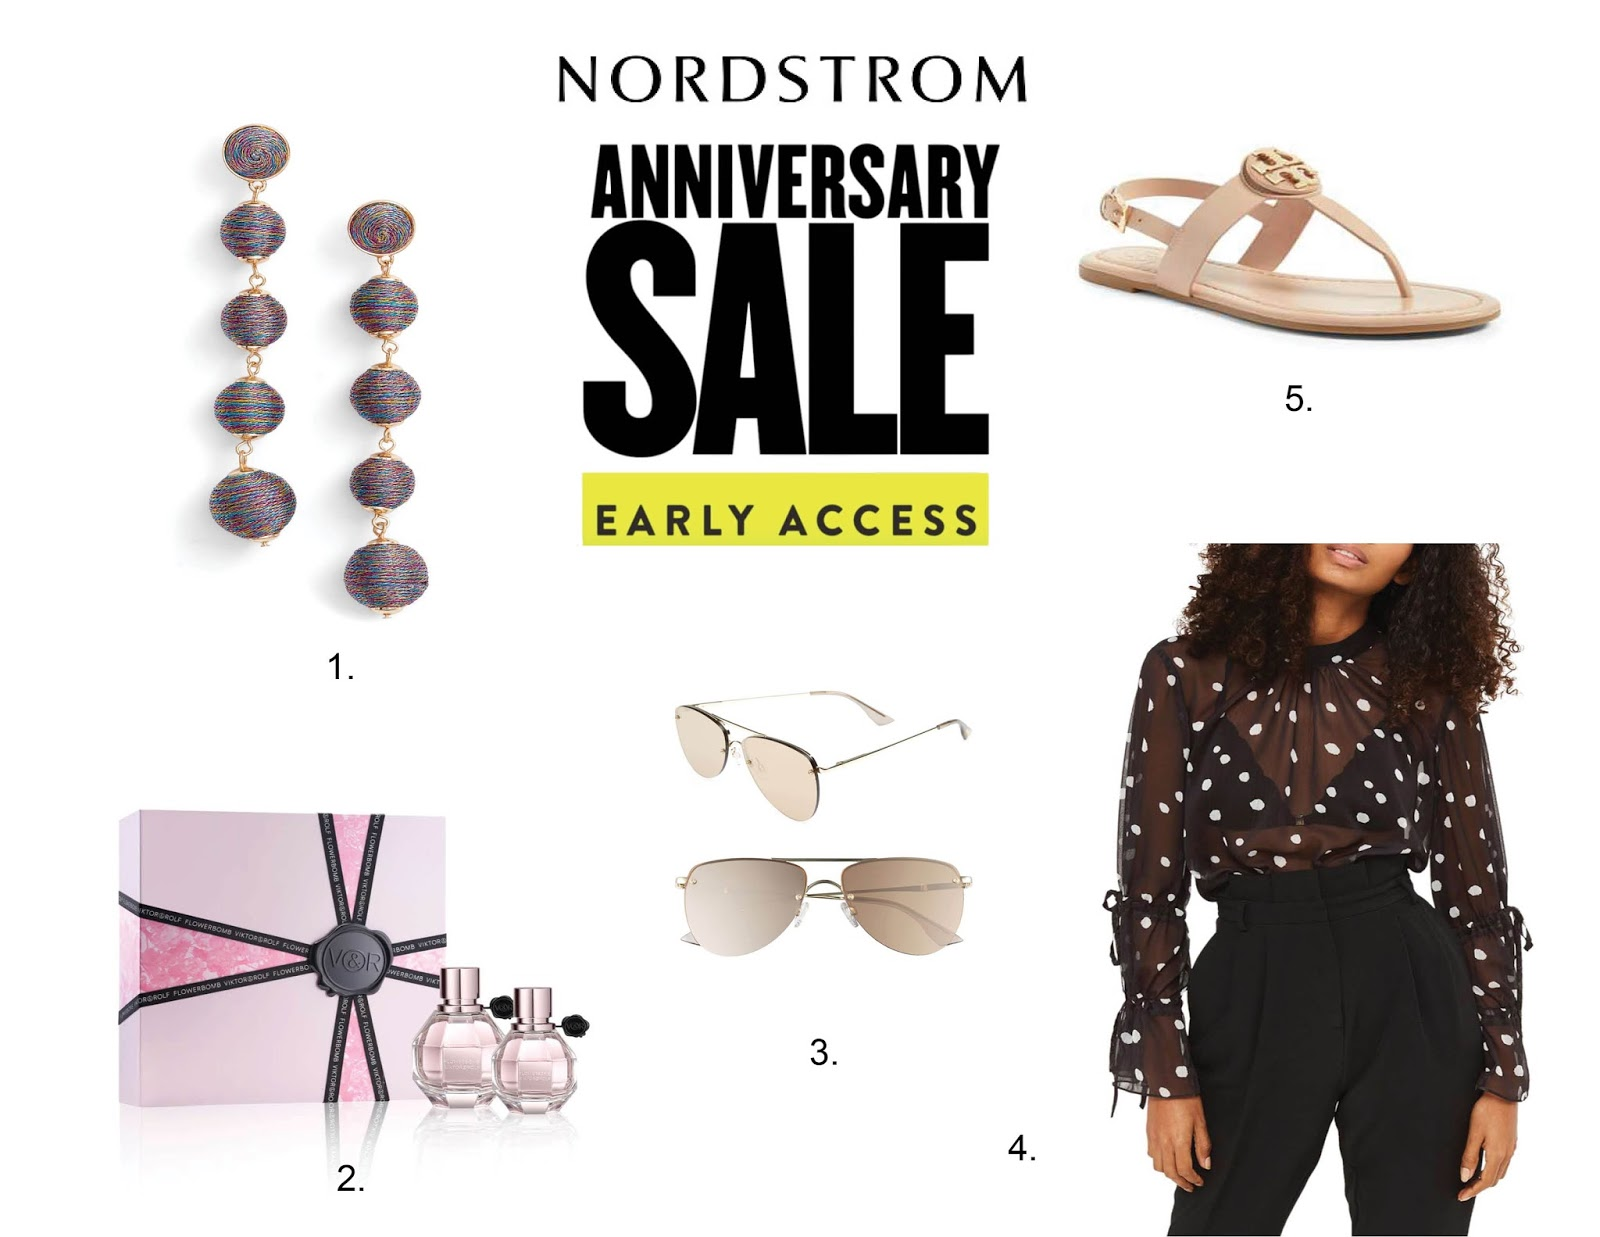 My Top Five Nordstrom Sale Picks